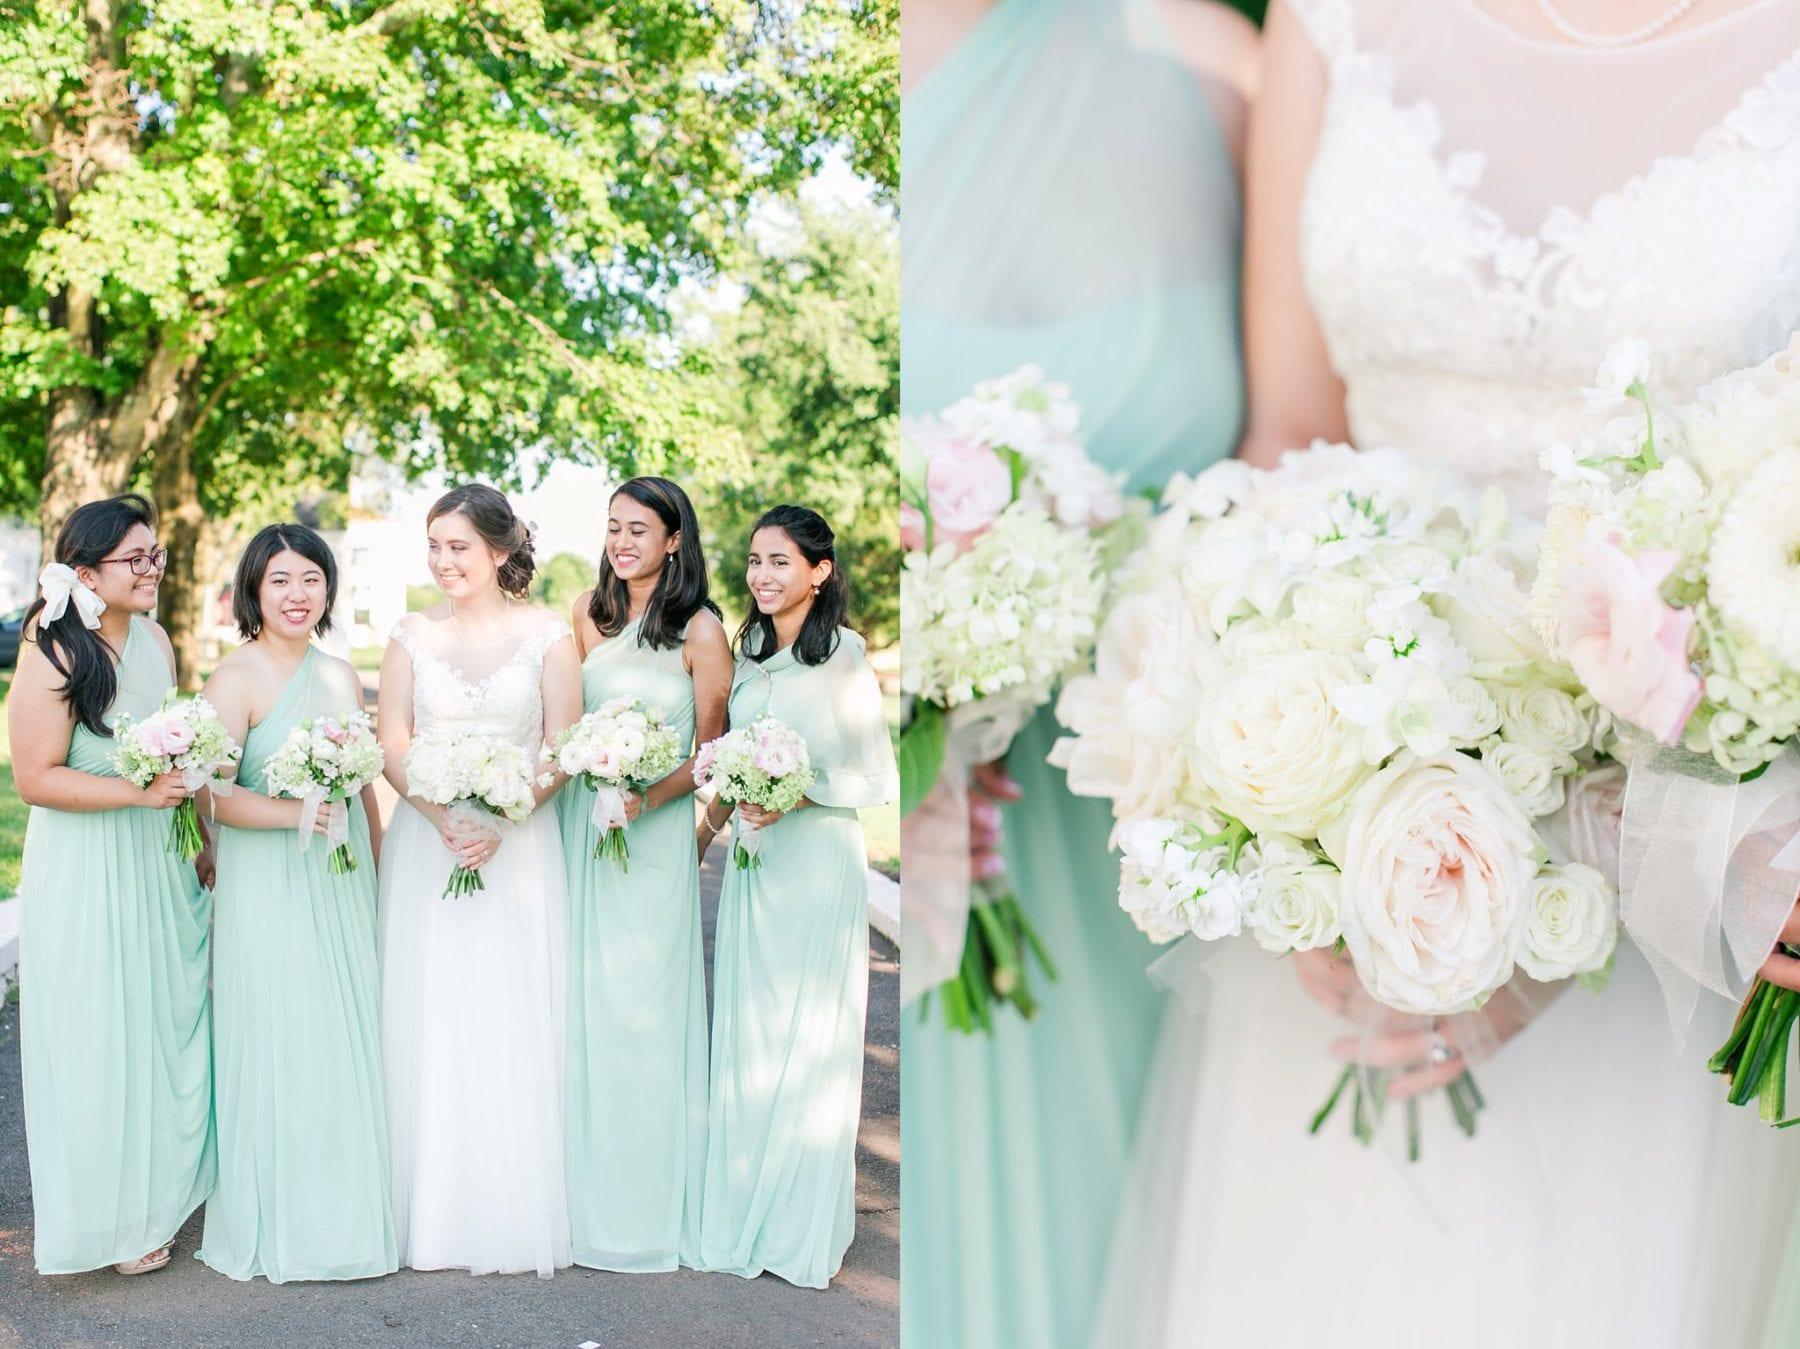 Bristow Manor Wedding Photos Virginia Wedding Photographer Lauren & Andrew Megan Kelsey Photography-456.jpg